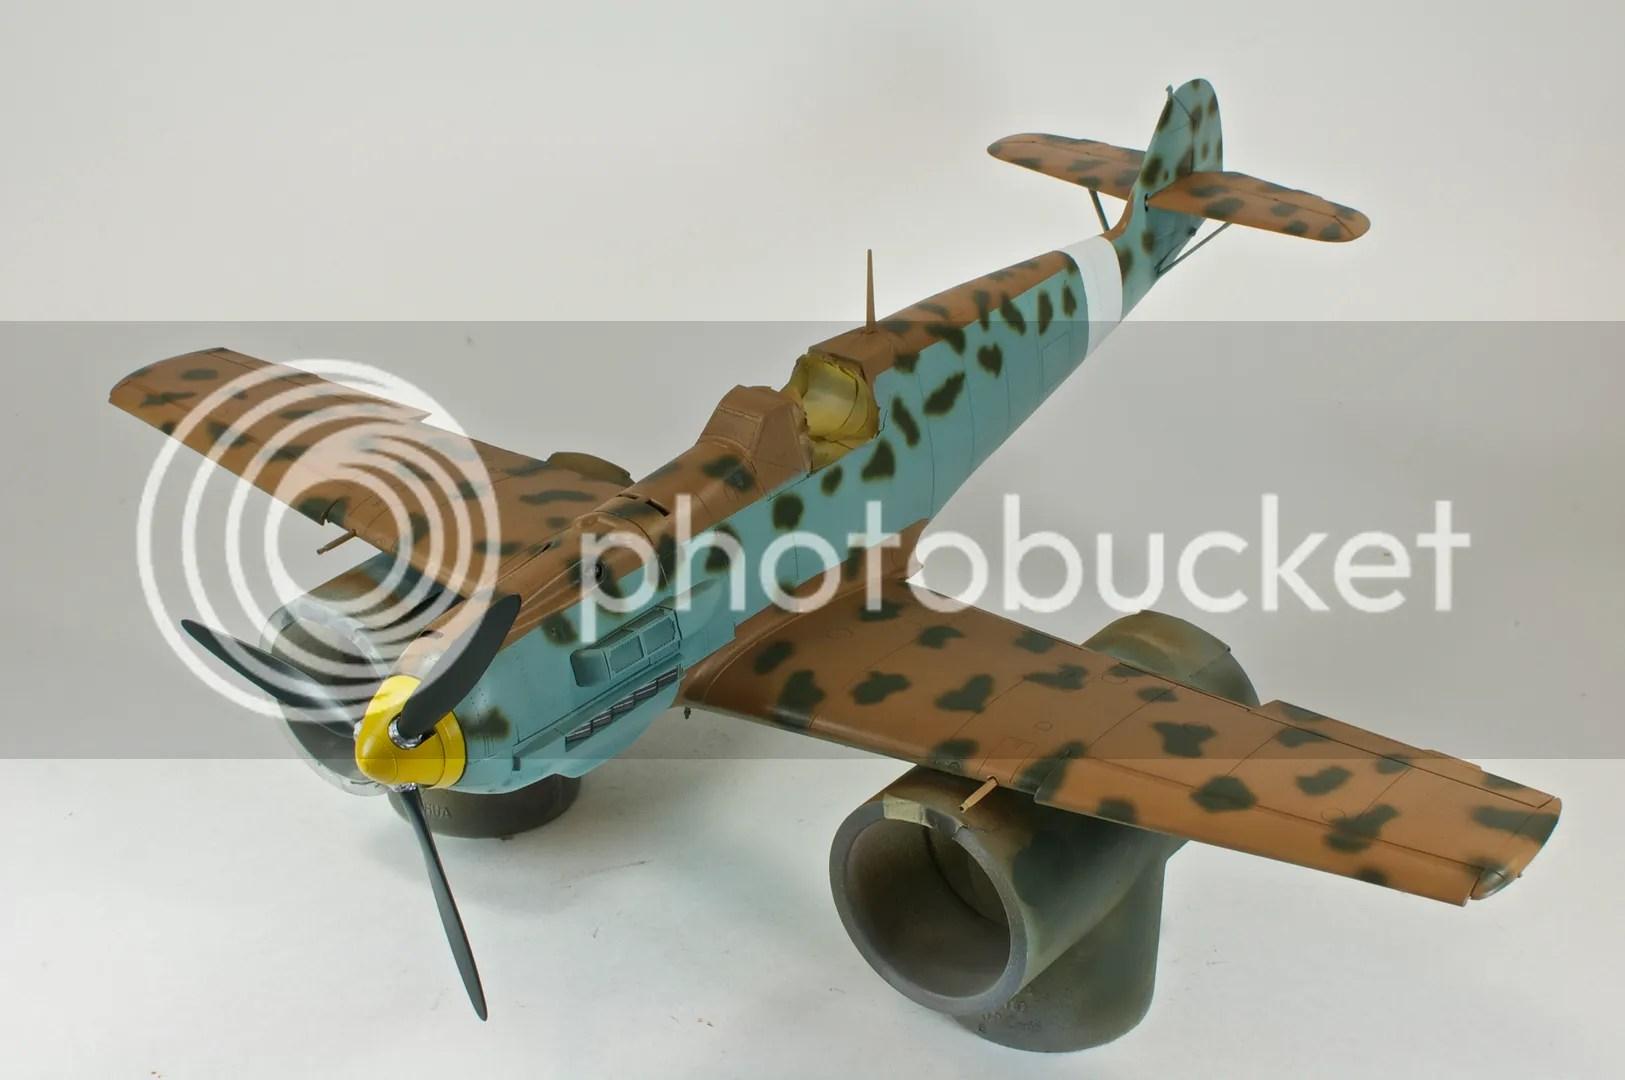 Eduard,2011,1/32,Bf 109E-7 Trop,February,Nikon D300s,scale models